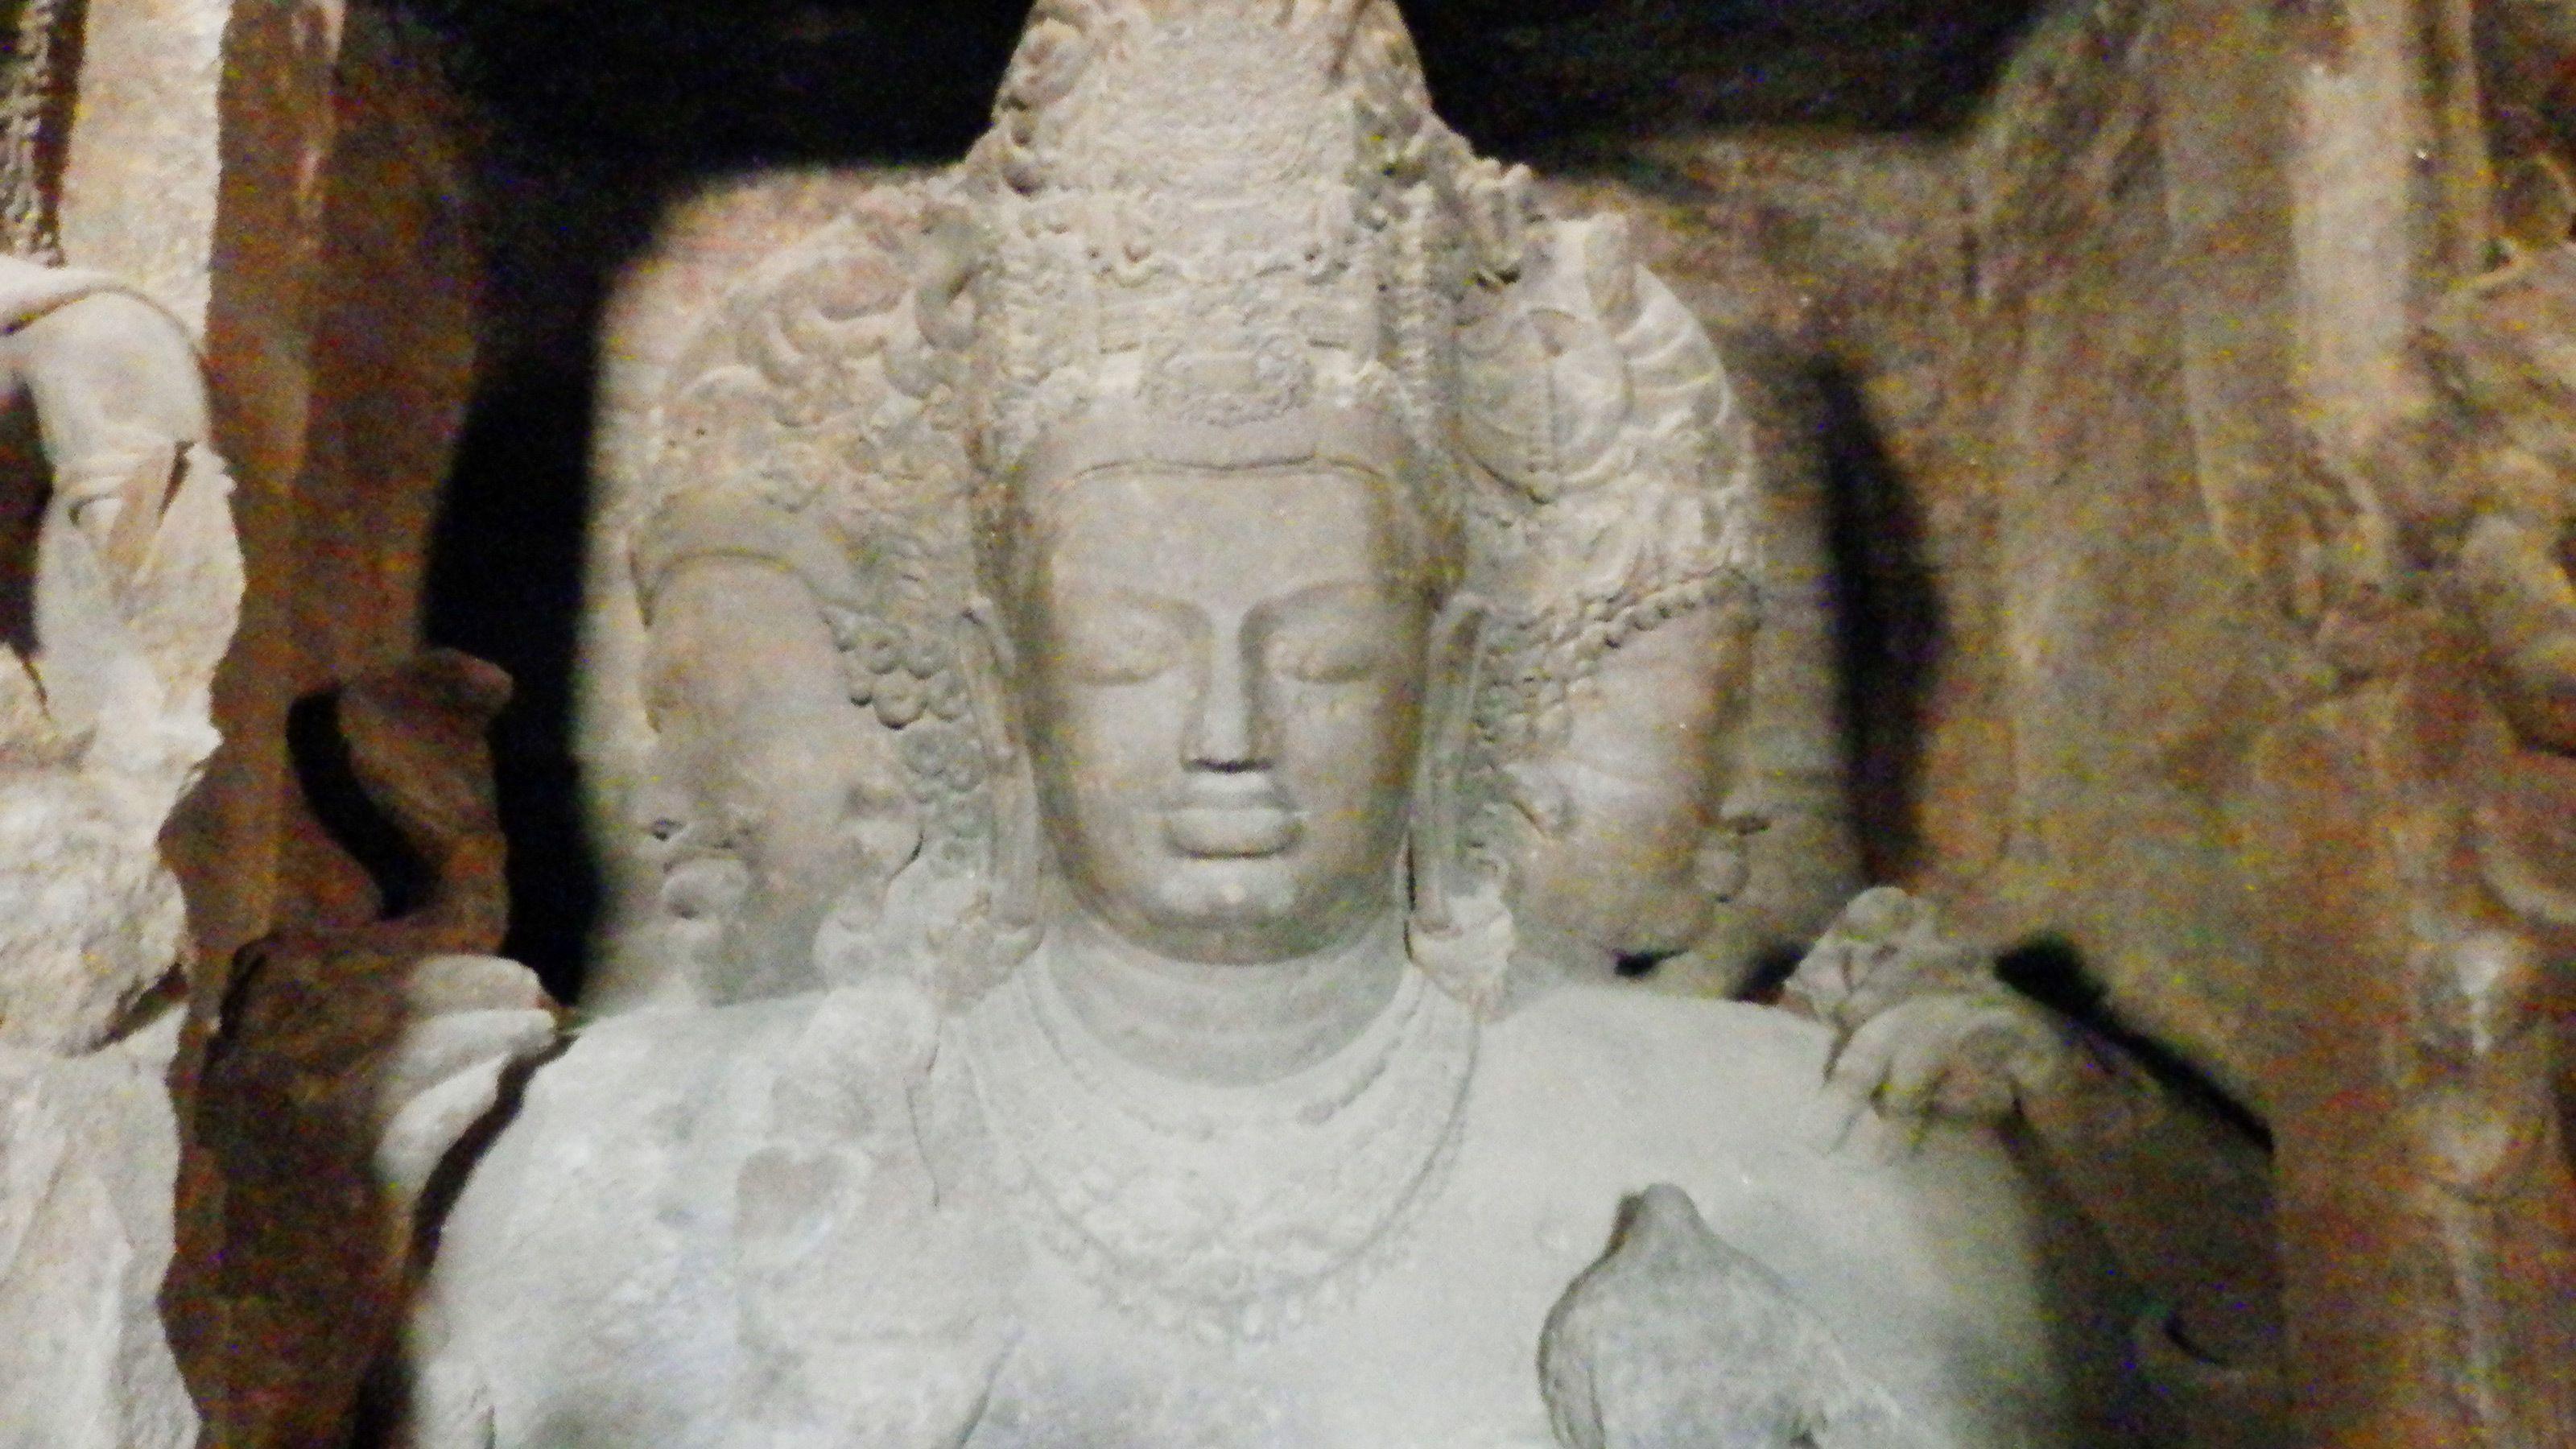 a sculpture at the Elephanta Caves